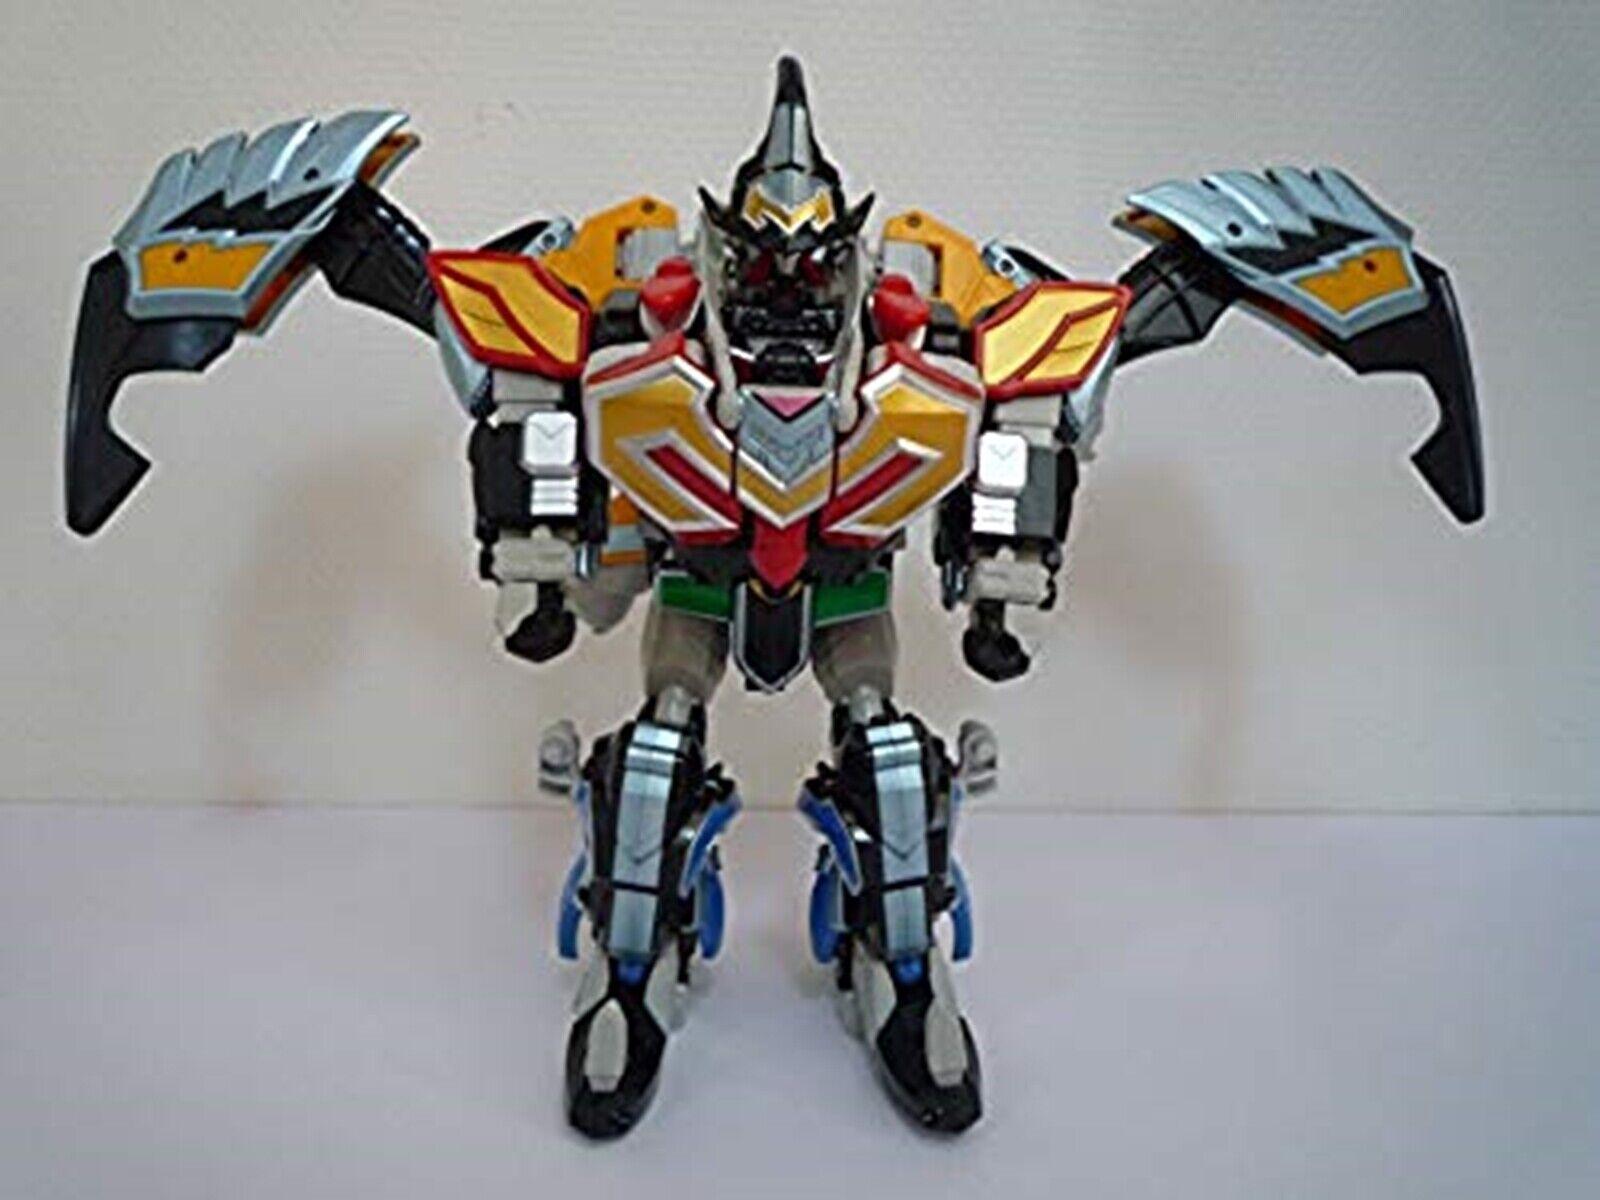 Bandai Power Rangers Mystic Force Dx Titan Megazord MAGIKING Japón utilizó